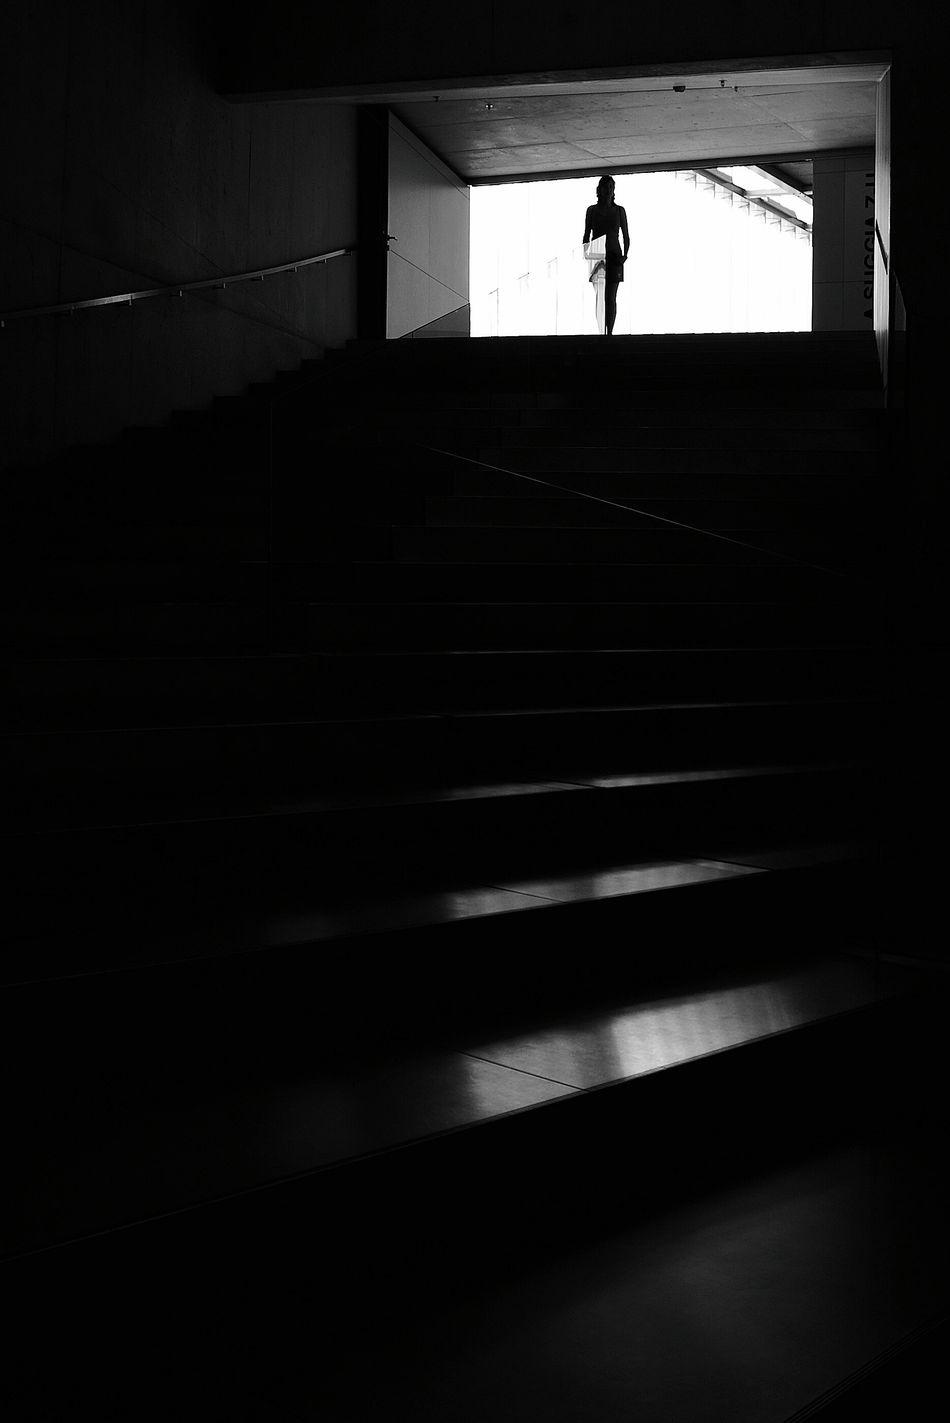 The Girl Who Wanted To Make Her Own Series Monochrome Getting Inspired Blanco & Negro  Black & White Blanco Y Negro EyeEm Best Shots - Black + White La Falsa Envoltura De Las Apariencias Siluetas Siluette